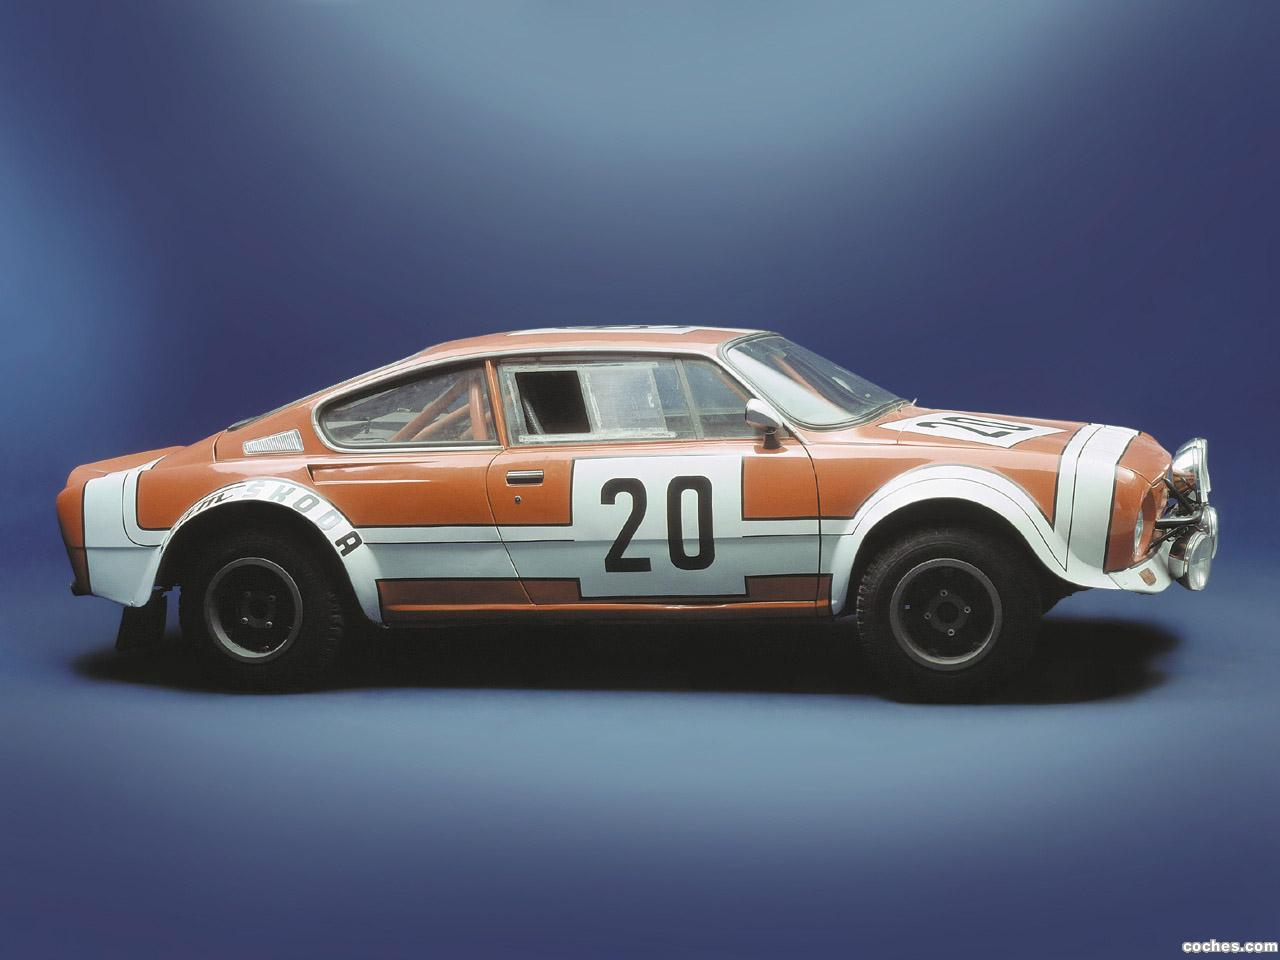 Foto 1 de Skoda 200 RS 1973